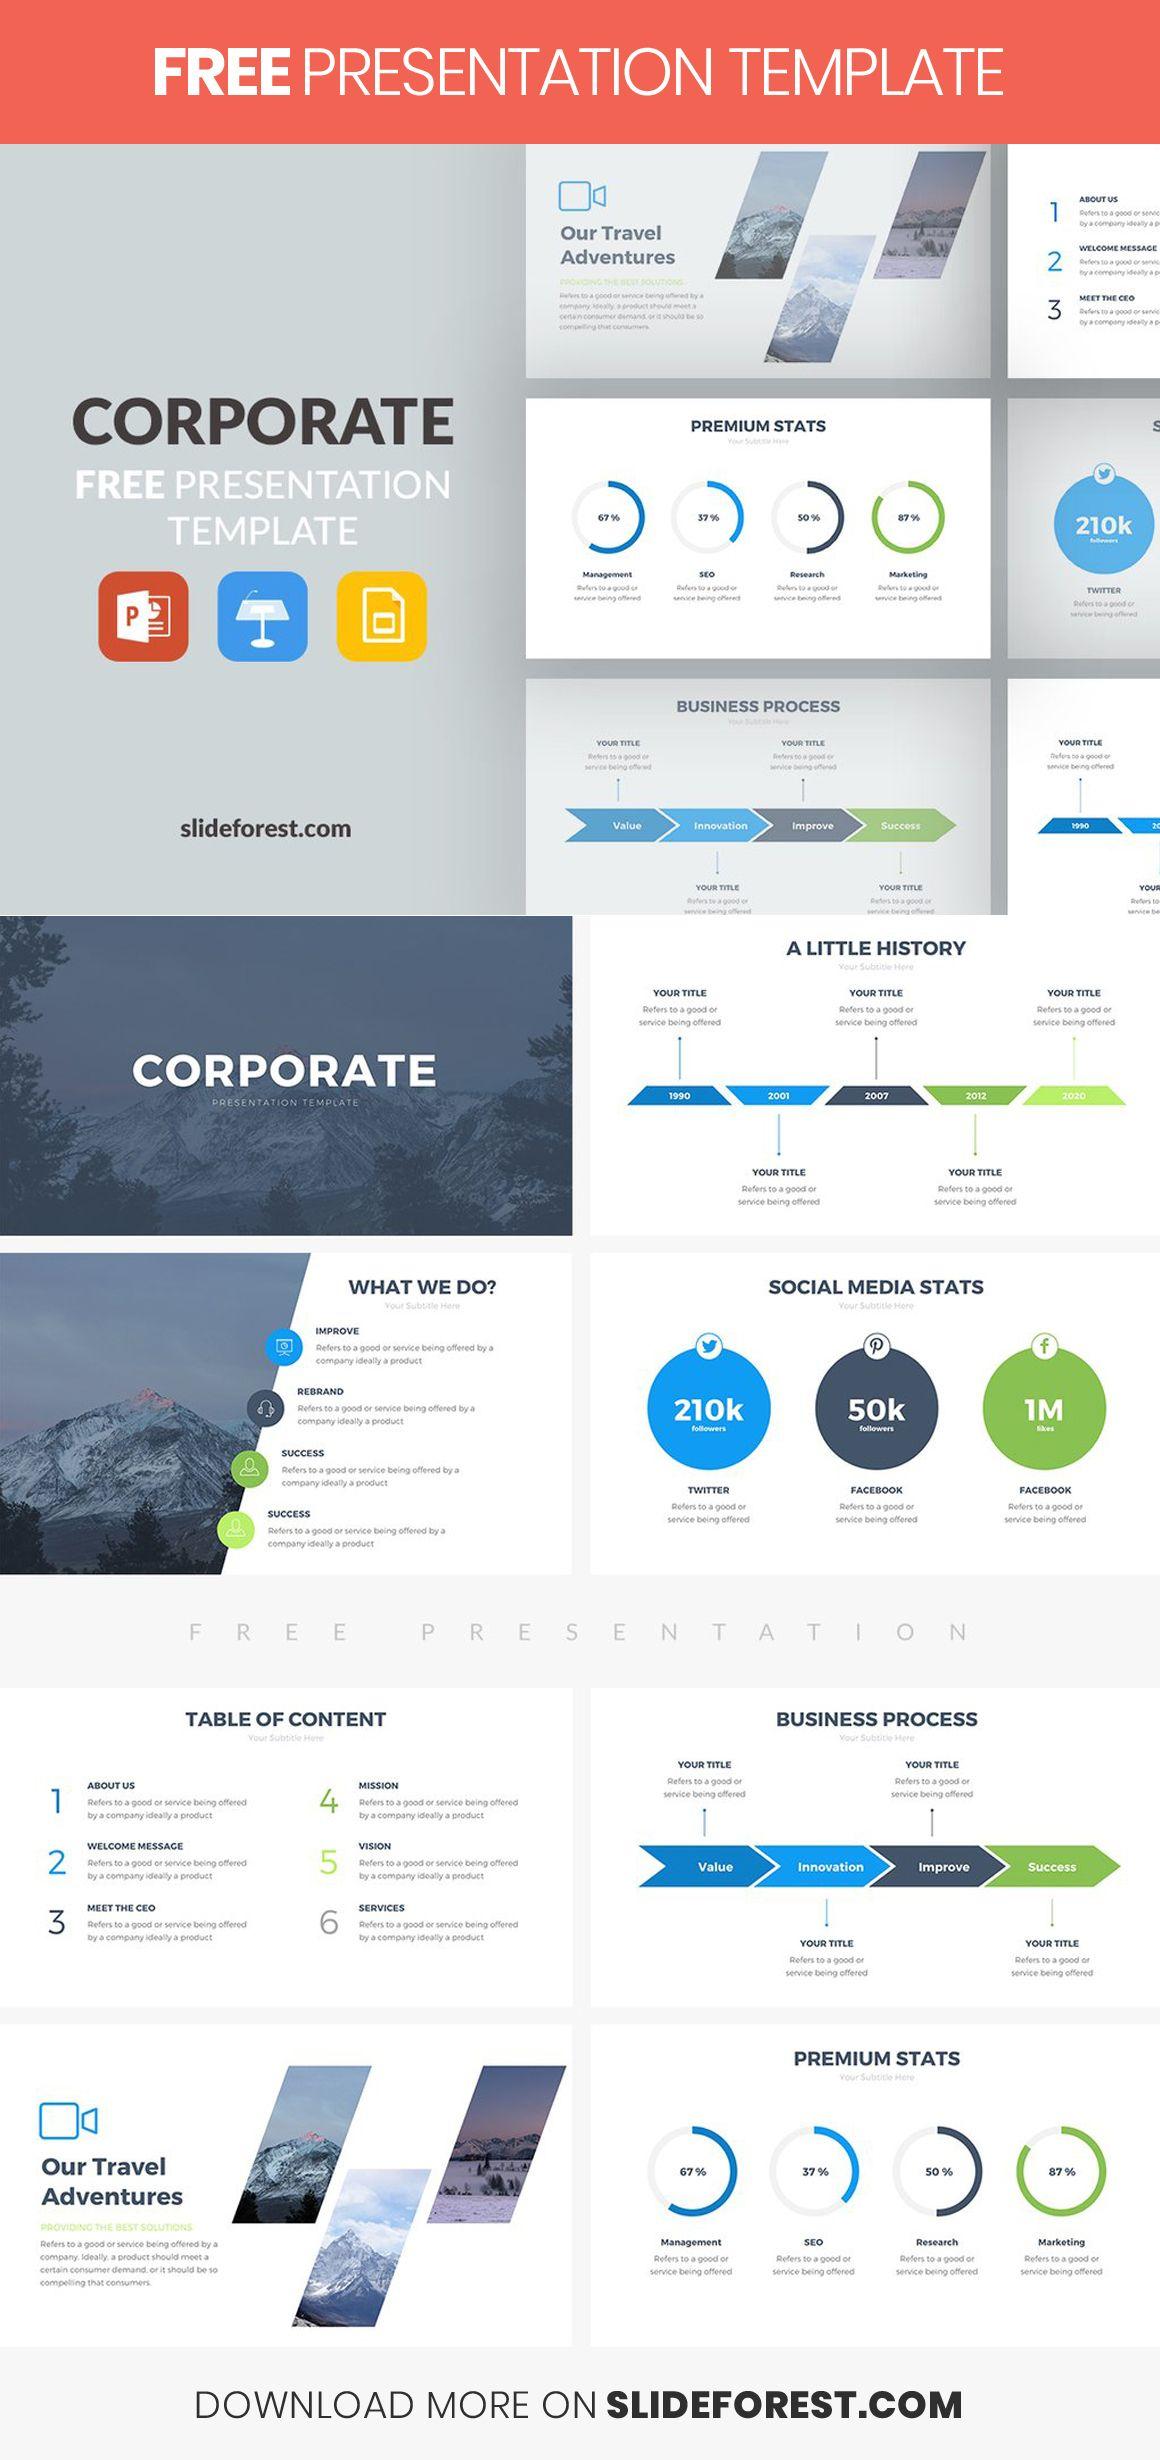 Corporate Free Presentation Template Presentation Template Free Powerpoint Presentation Design Presentation Slides Design